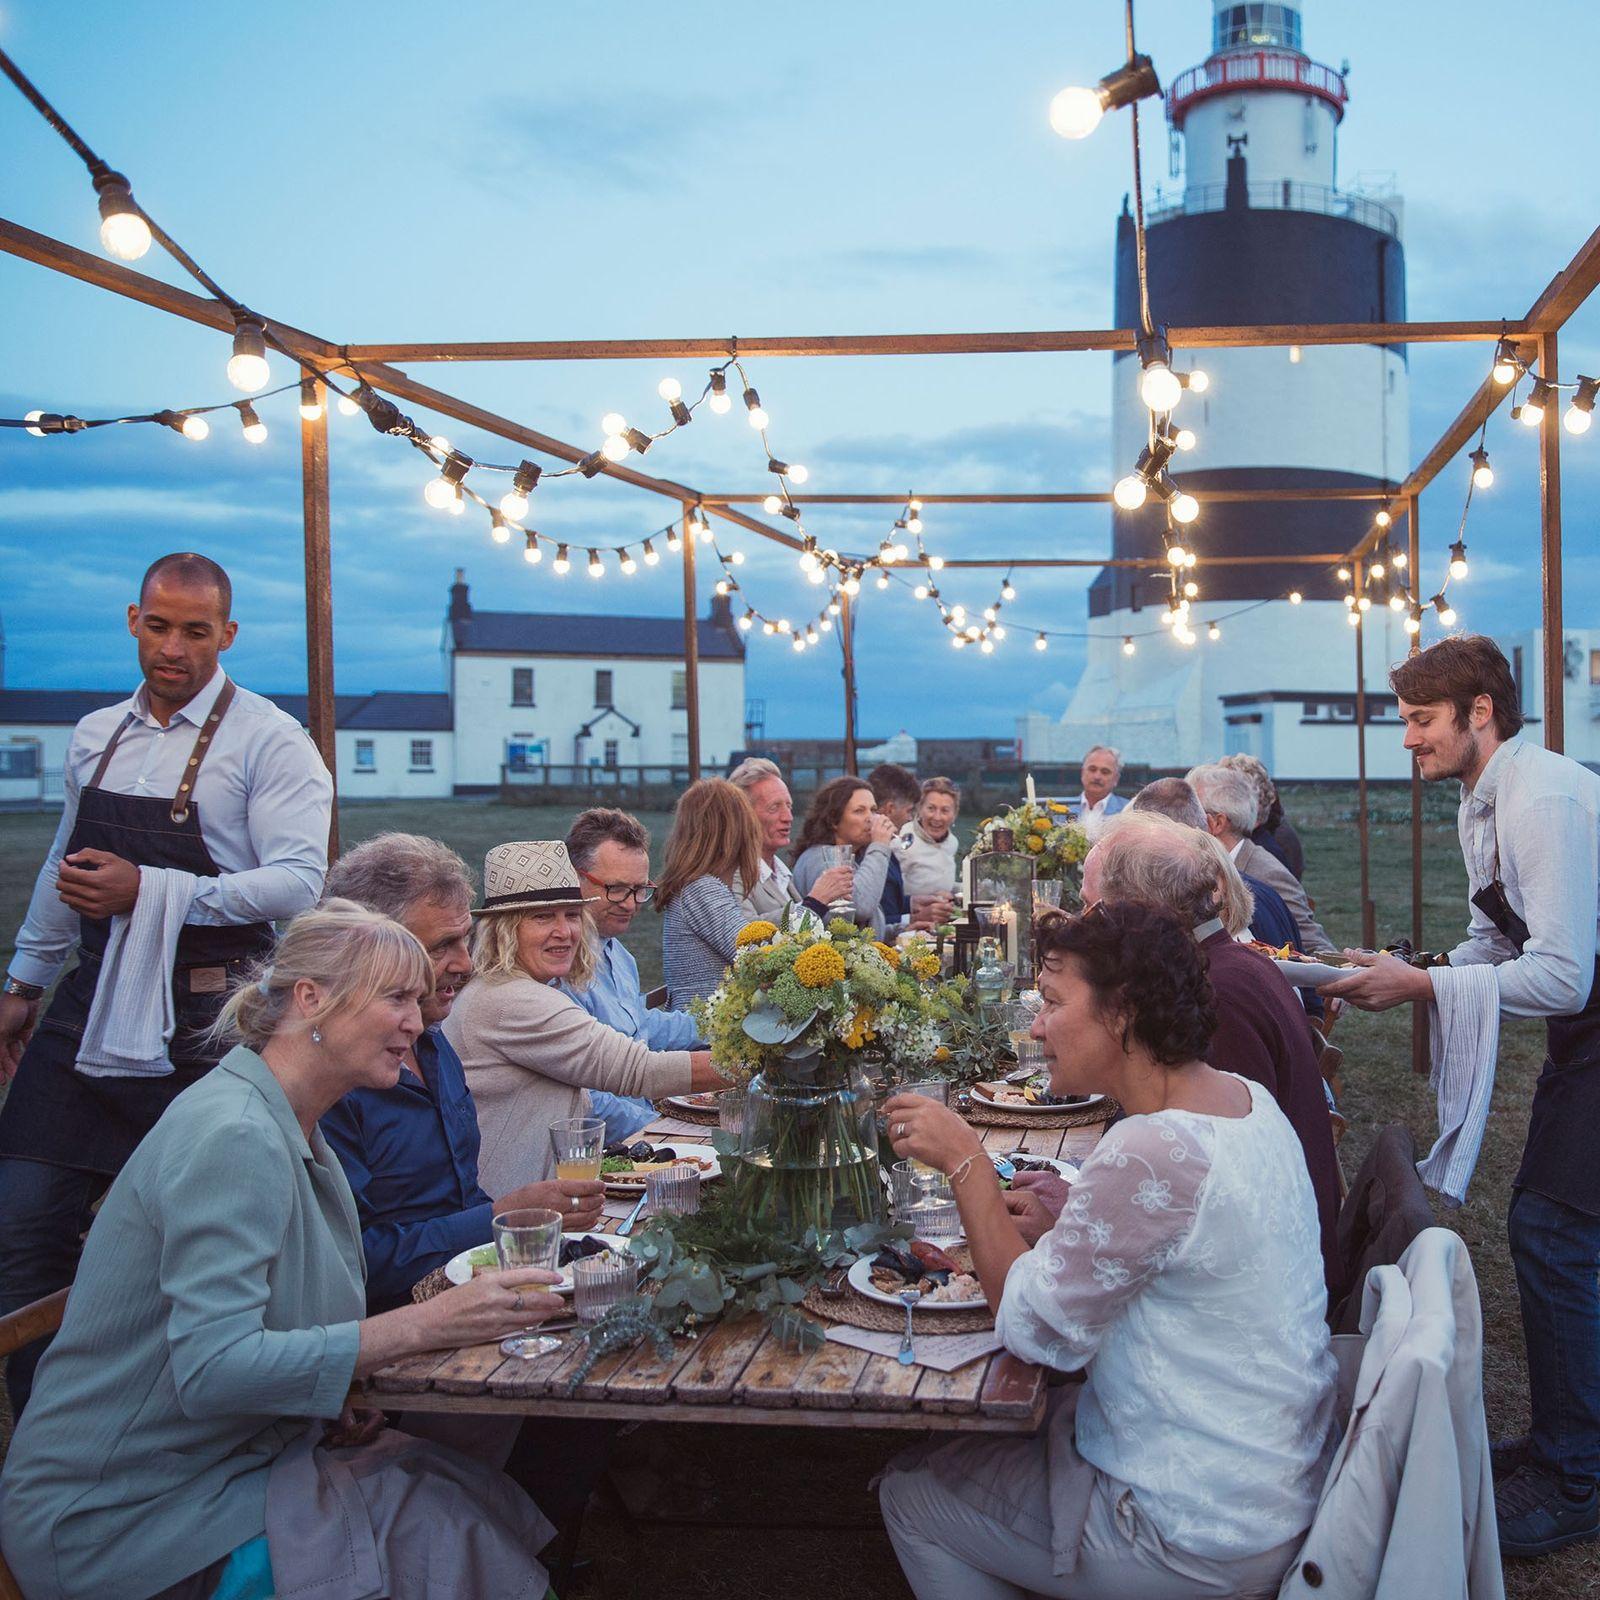 Dinner served at Hook Head Lighthouse